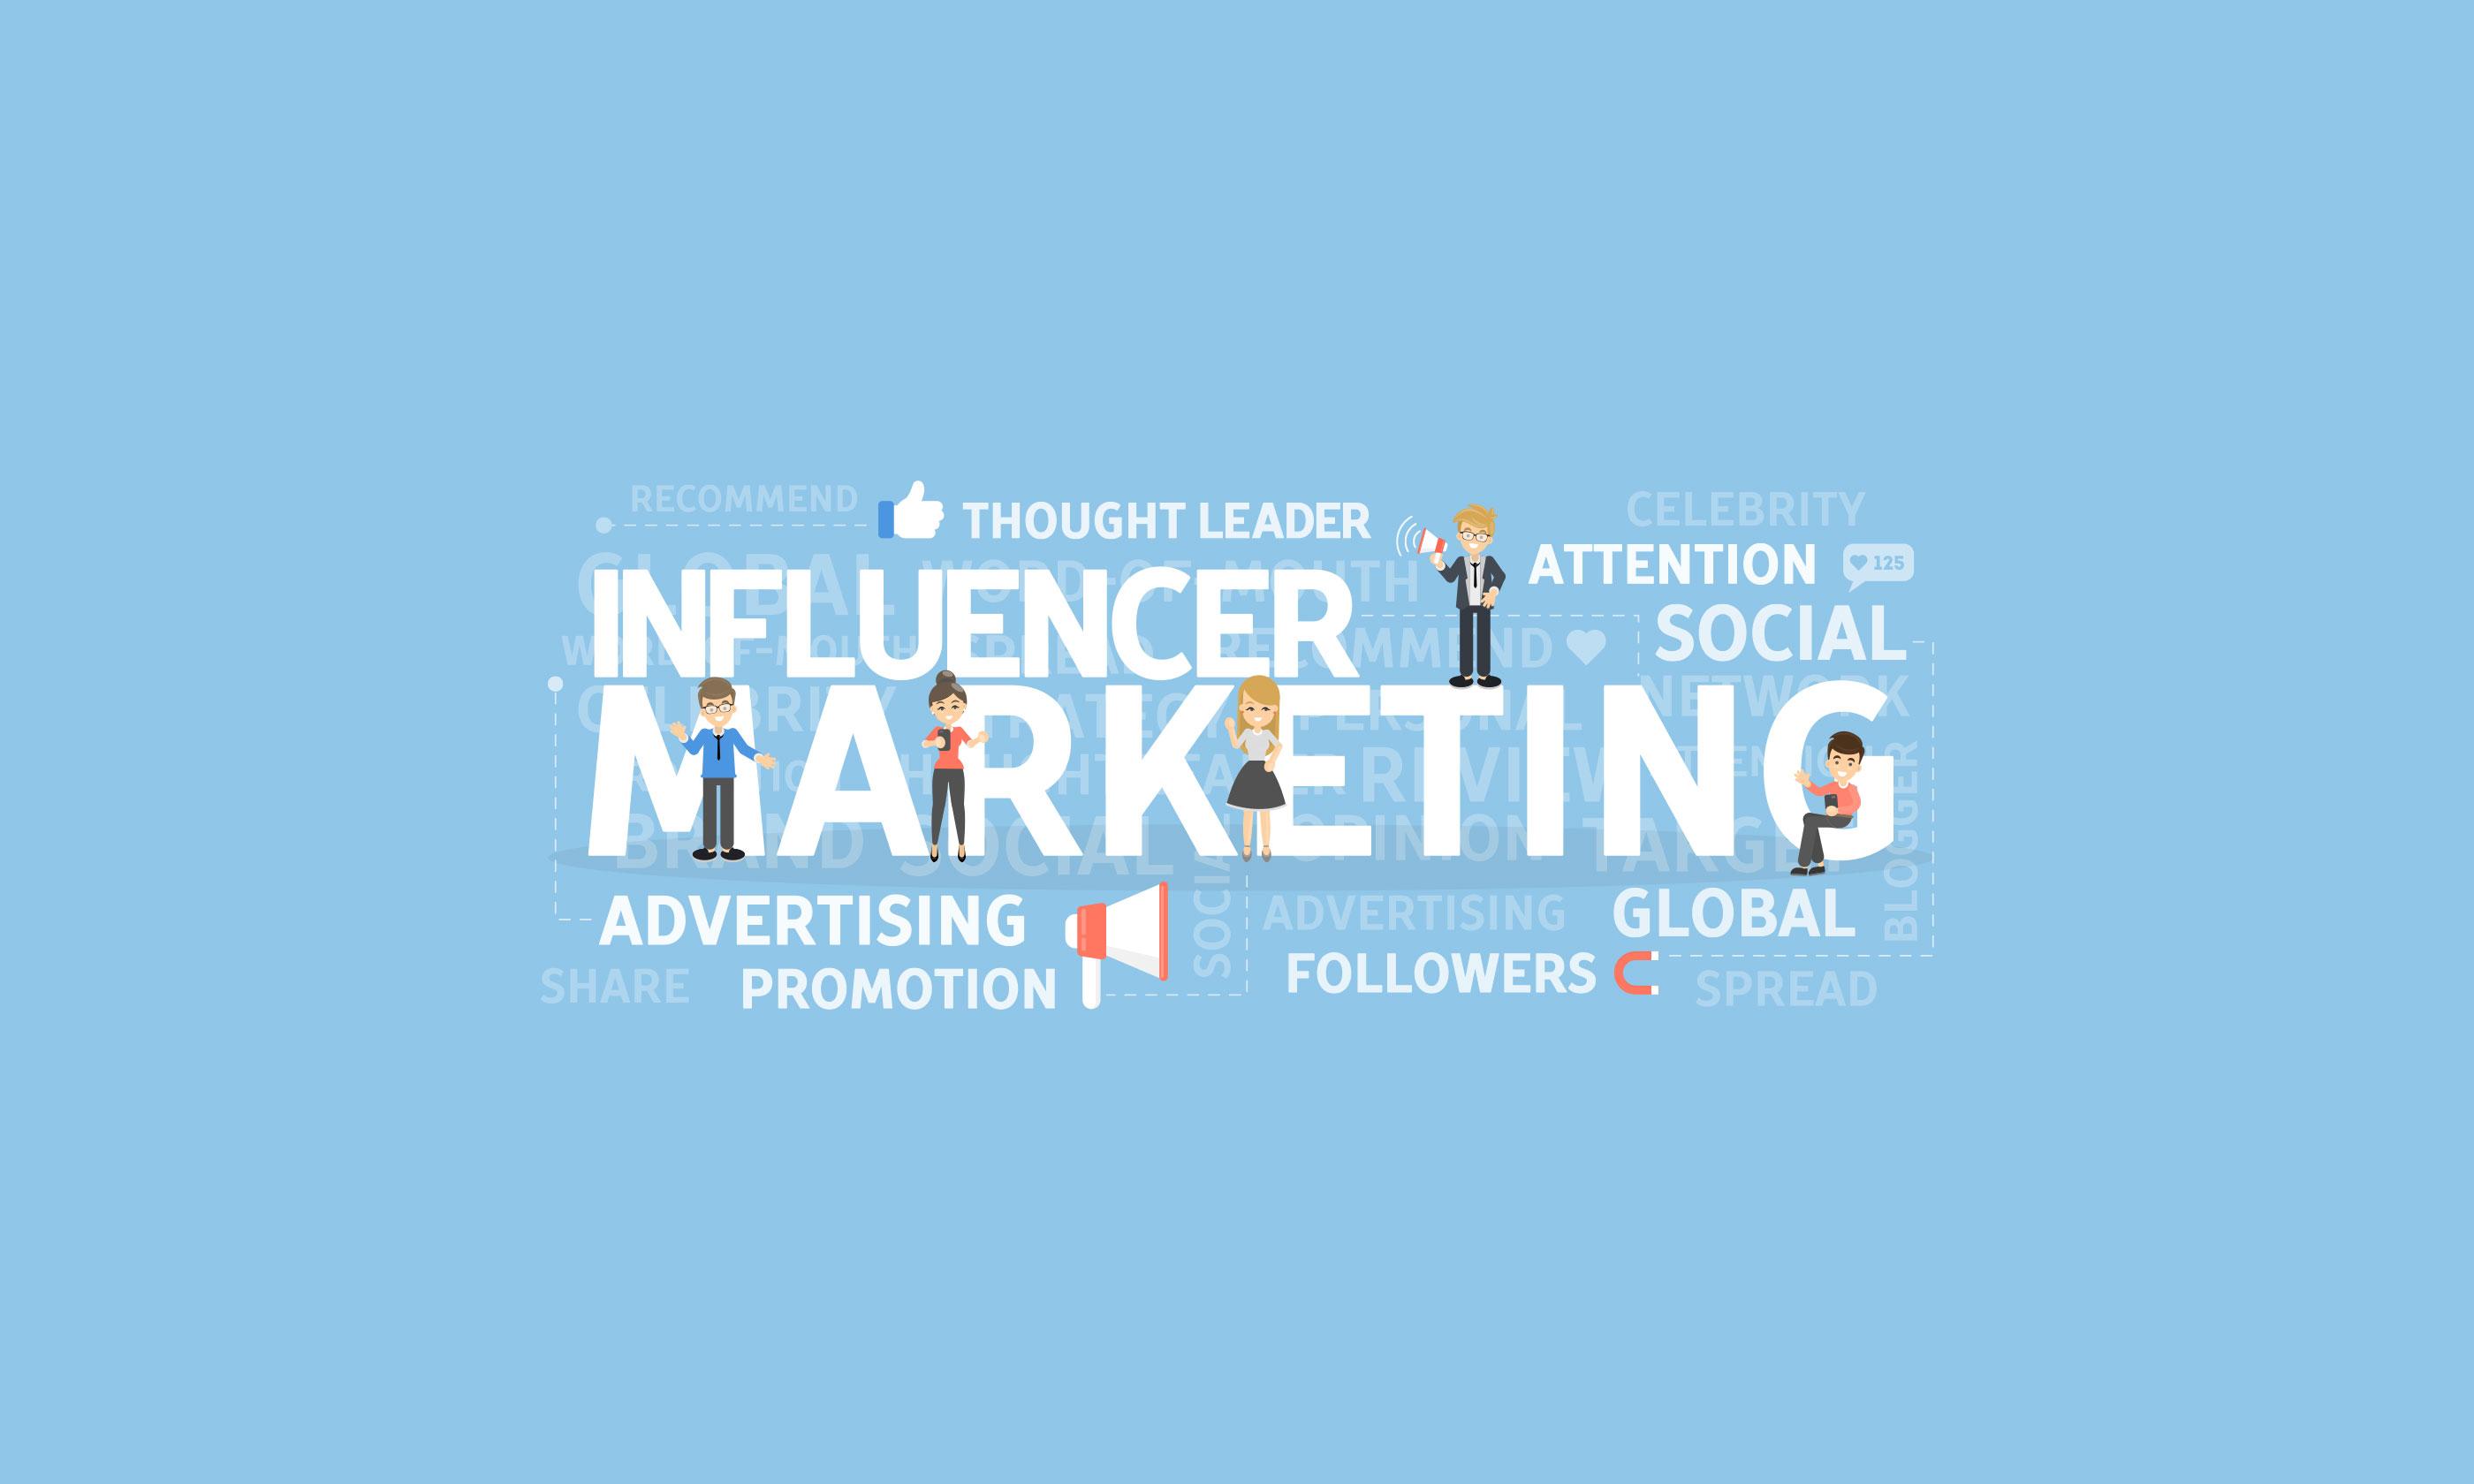 Influencer Marketing Slider - Advertising, Promotion, Social, Share